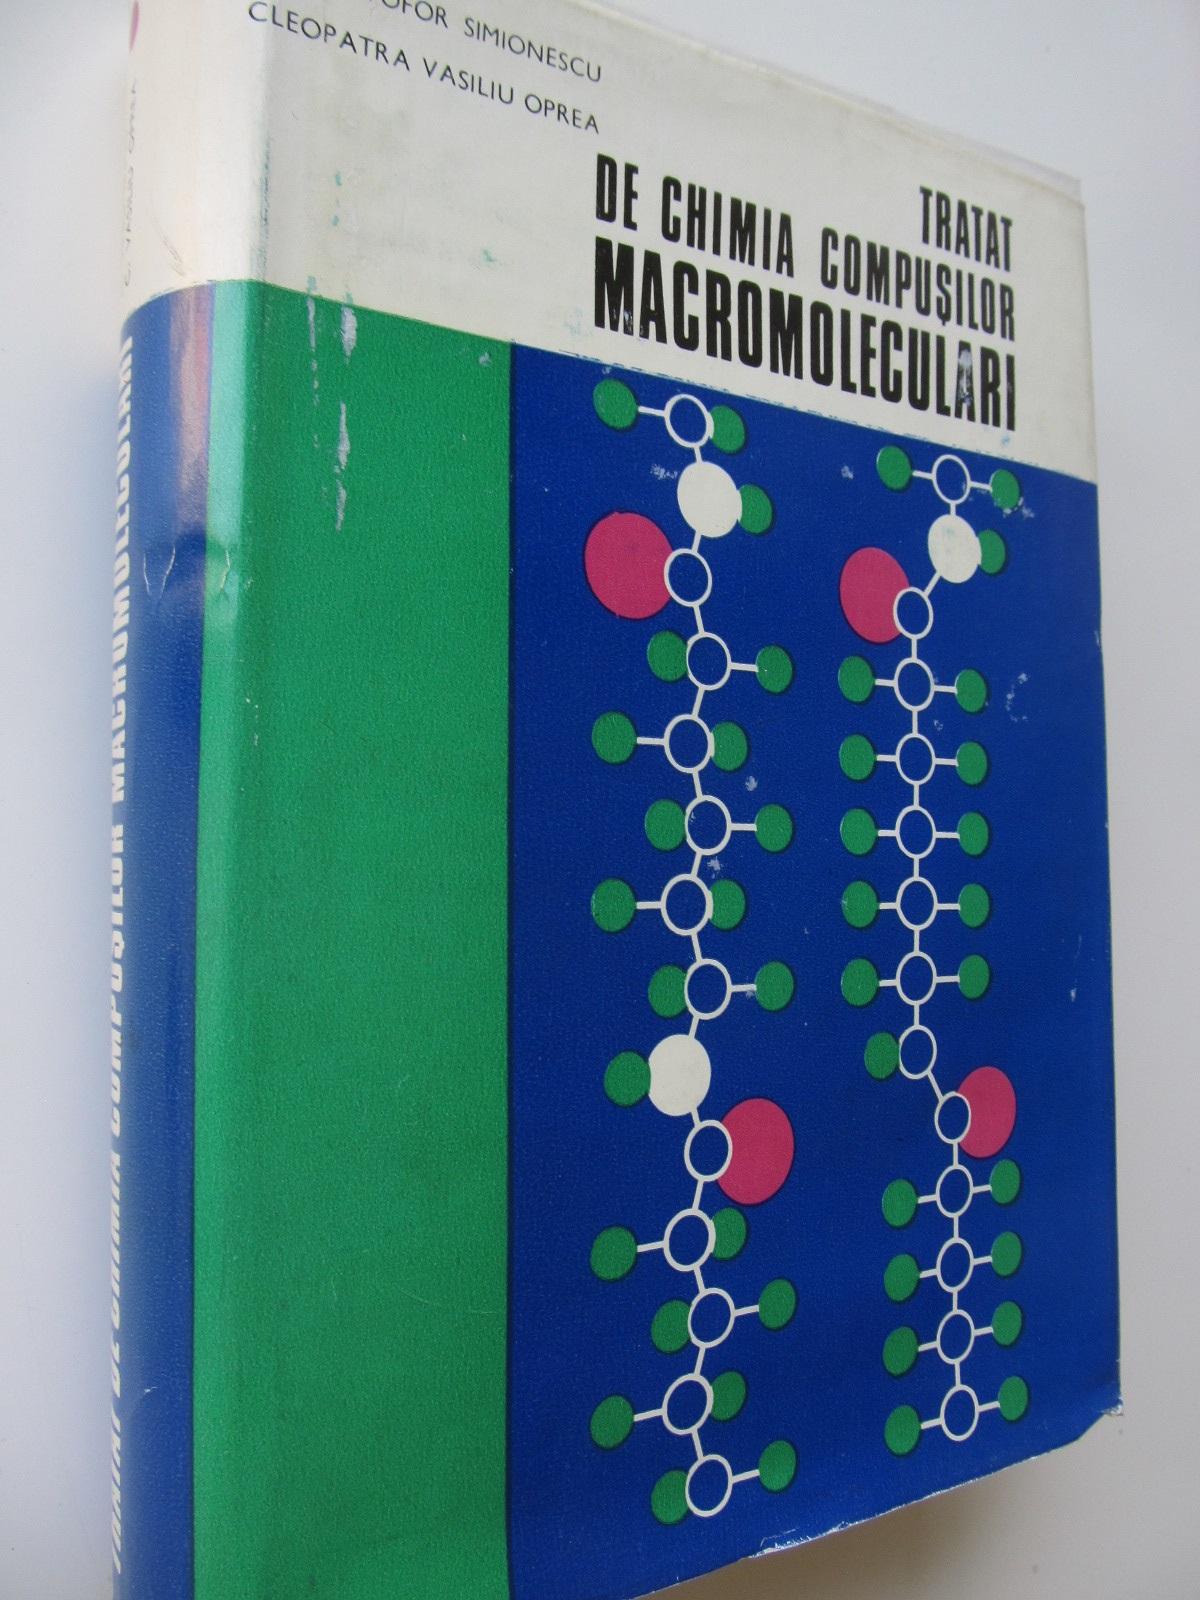 Tratat de chimia compusilor macromoleculari (vol. I) - Cristofor Simionescu , Cleopatra Vasiliu Oprea | Detalii carte